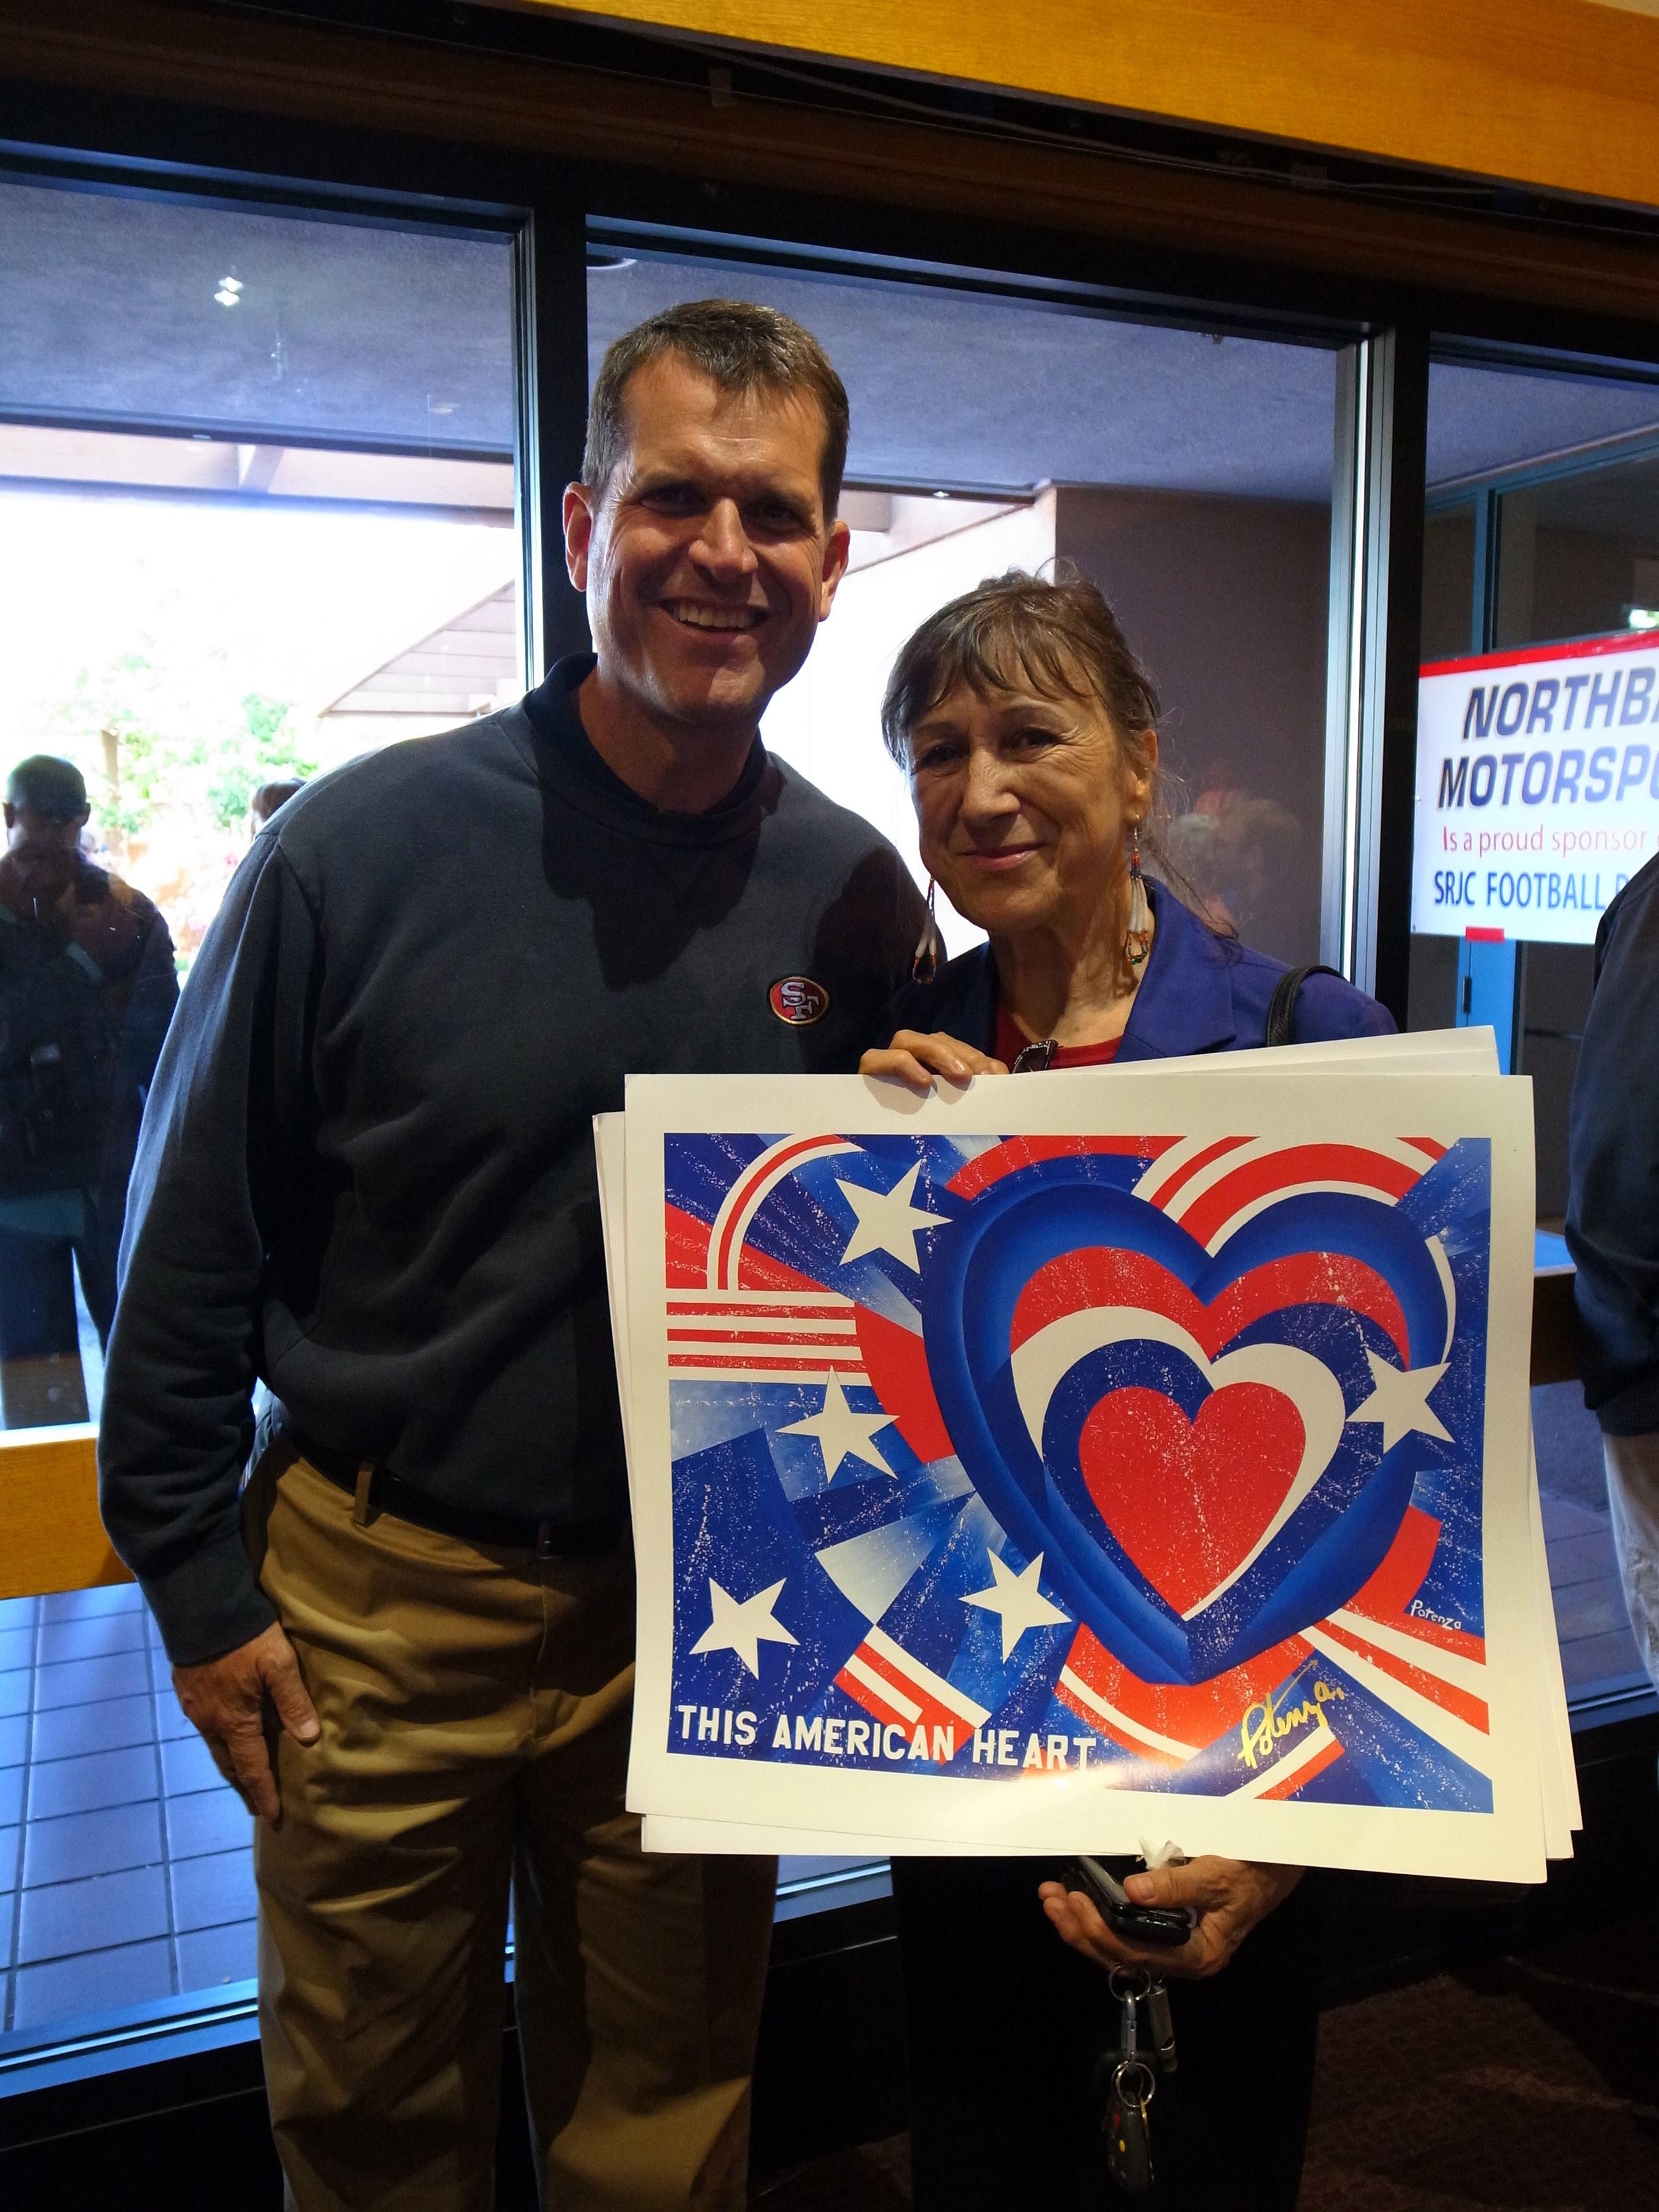 Jim Harbaugh, This American Heart